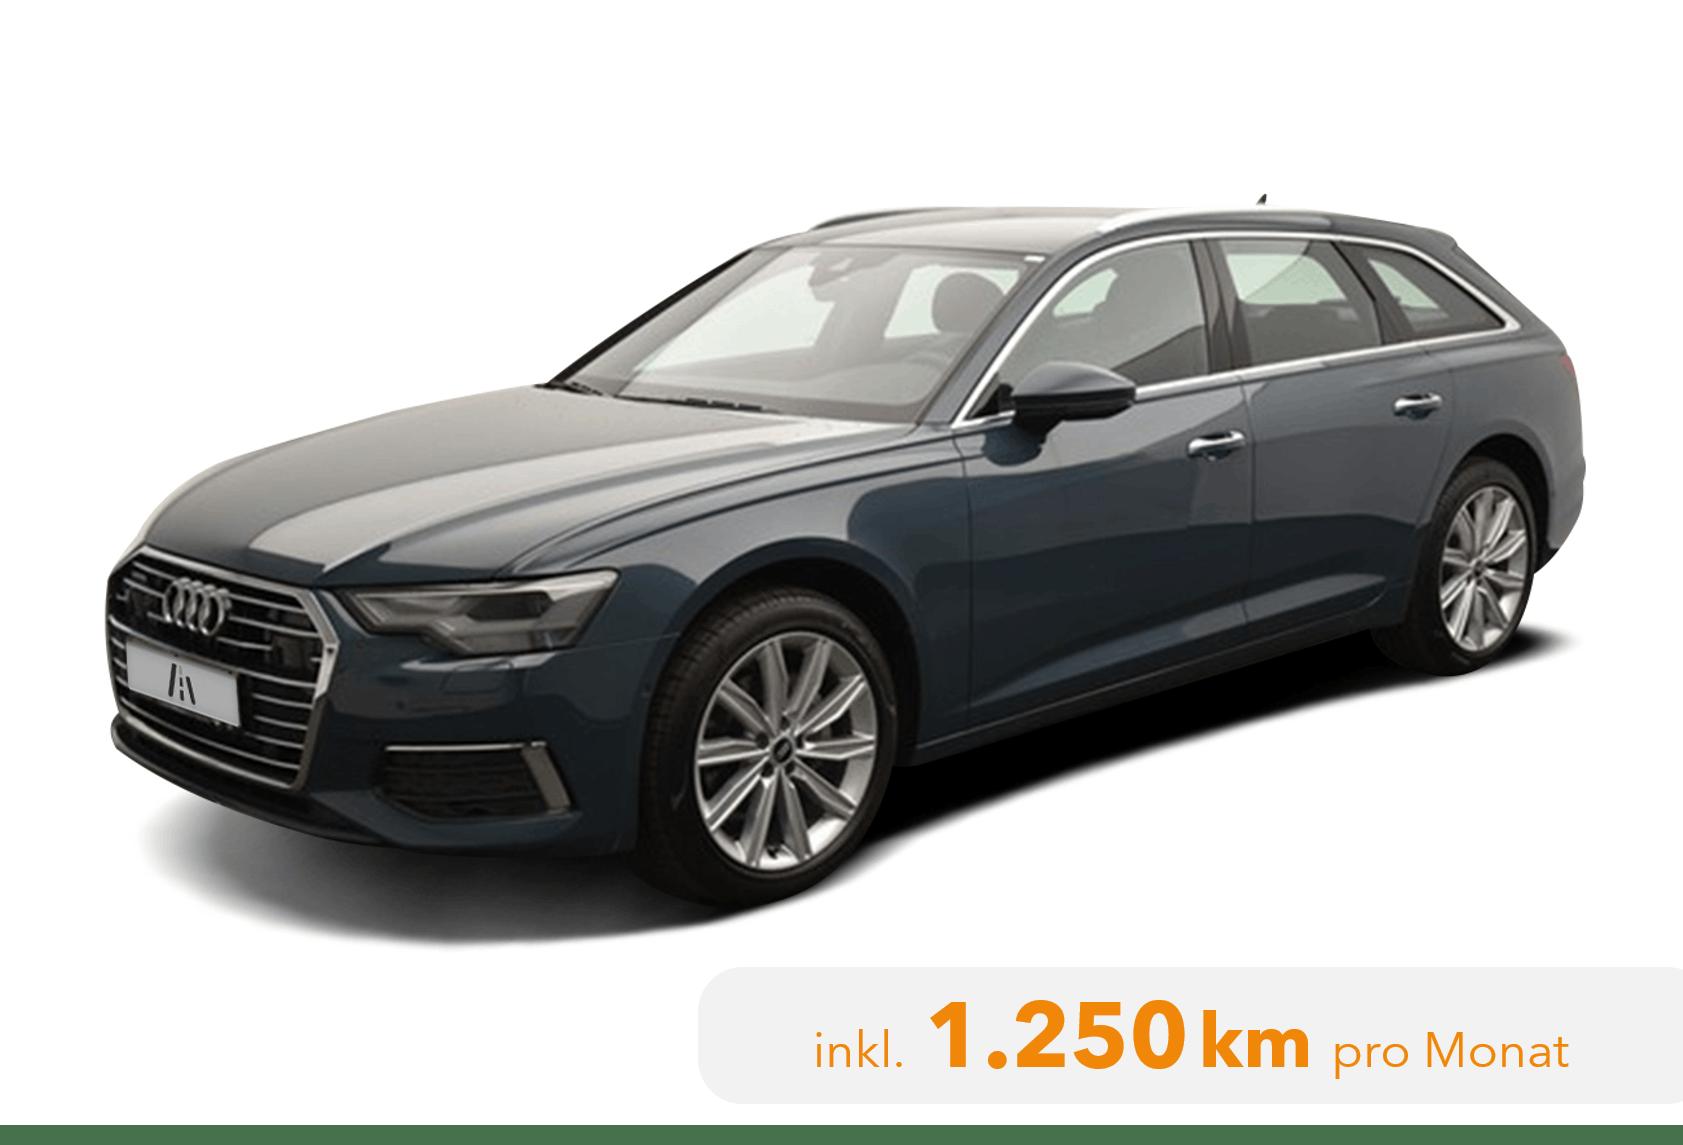 Audi A6 Avant quattro 4x4